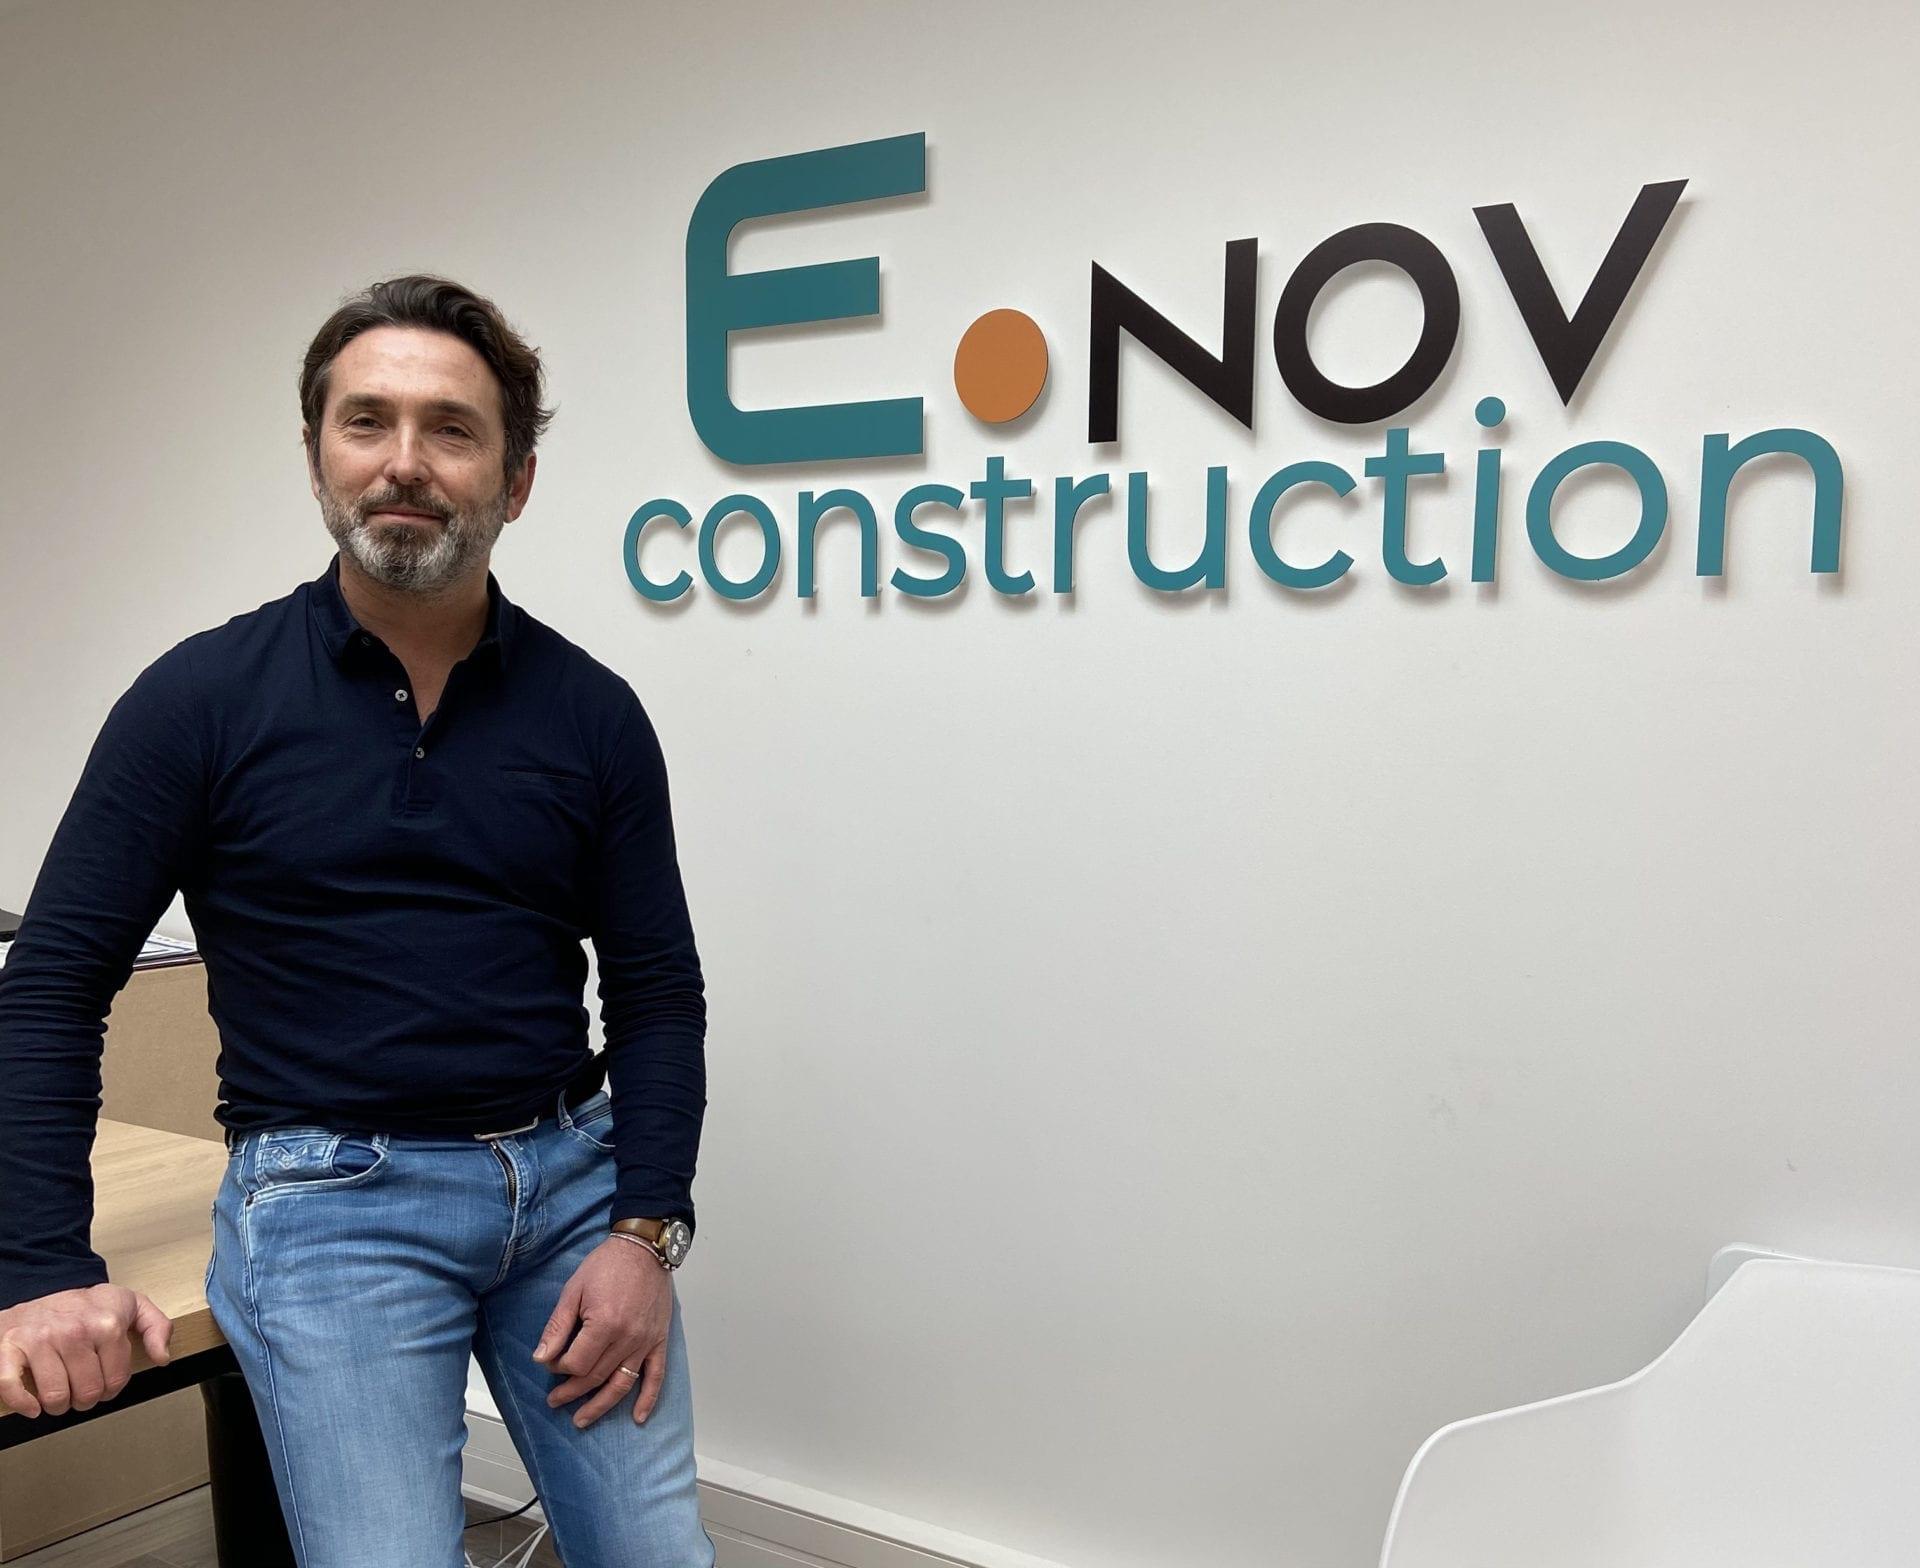 photo de bruno aubert - président de E.nov construction